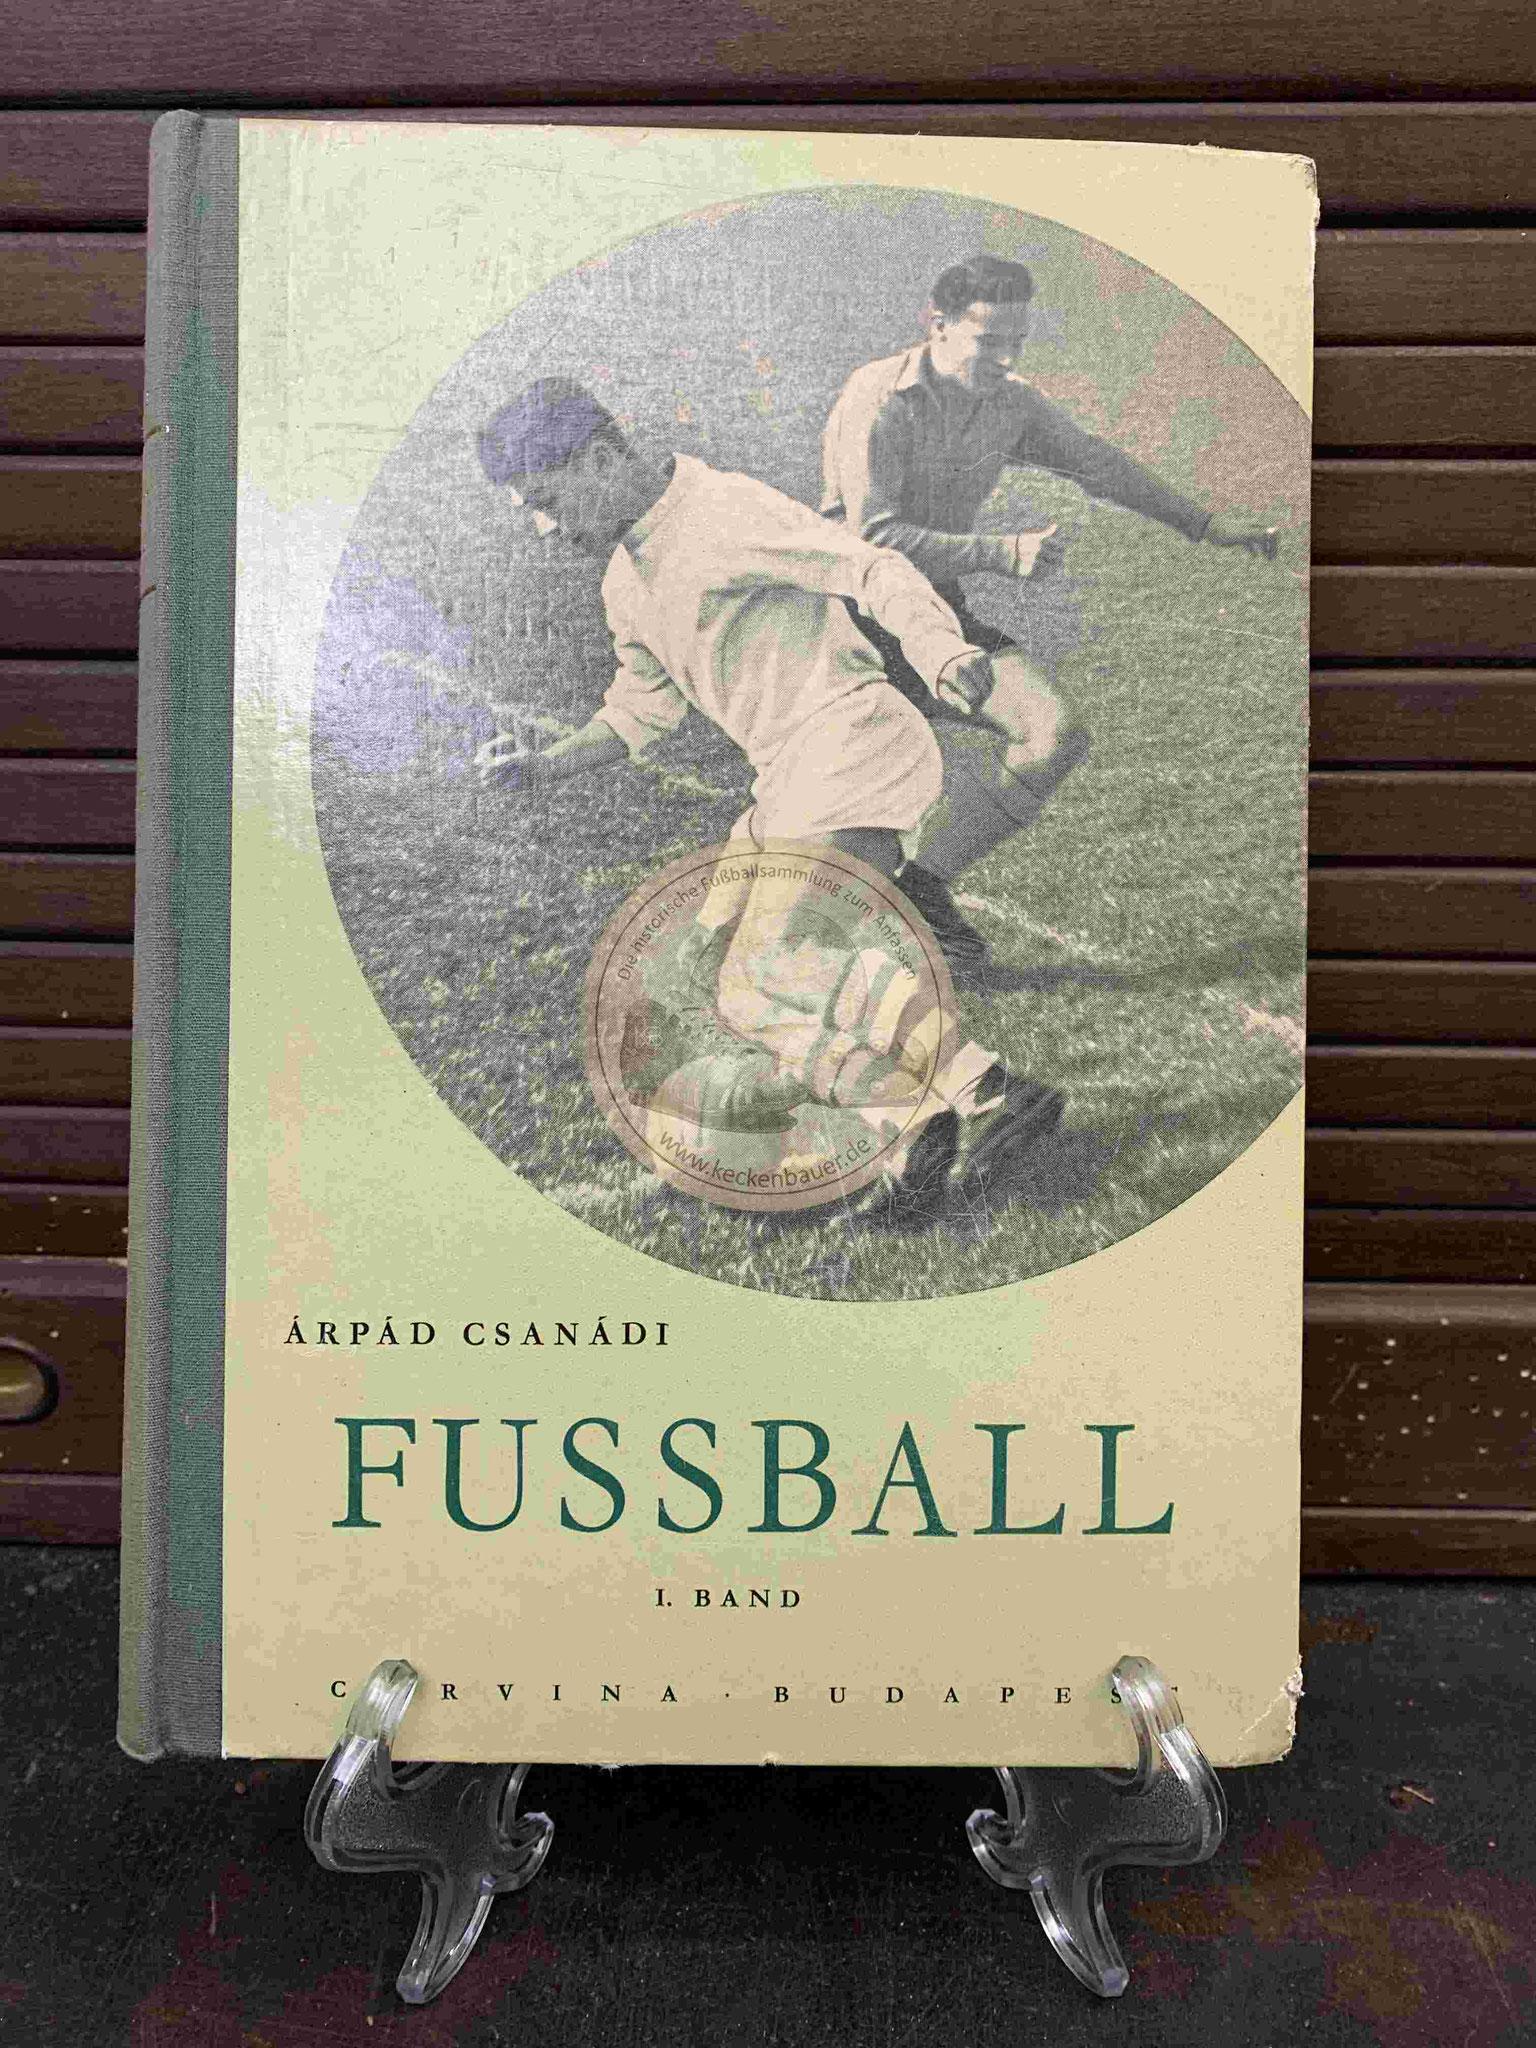 Arpad Csanadi Fussball Band 2 aus dem Jahr 1957